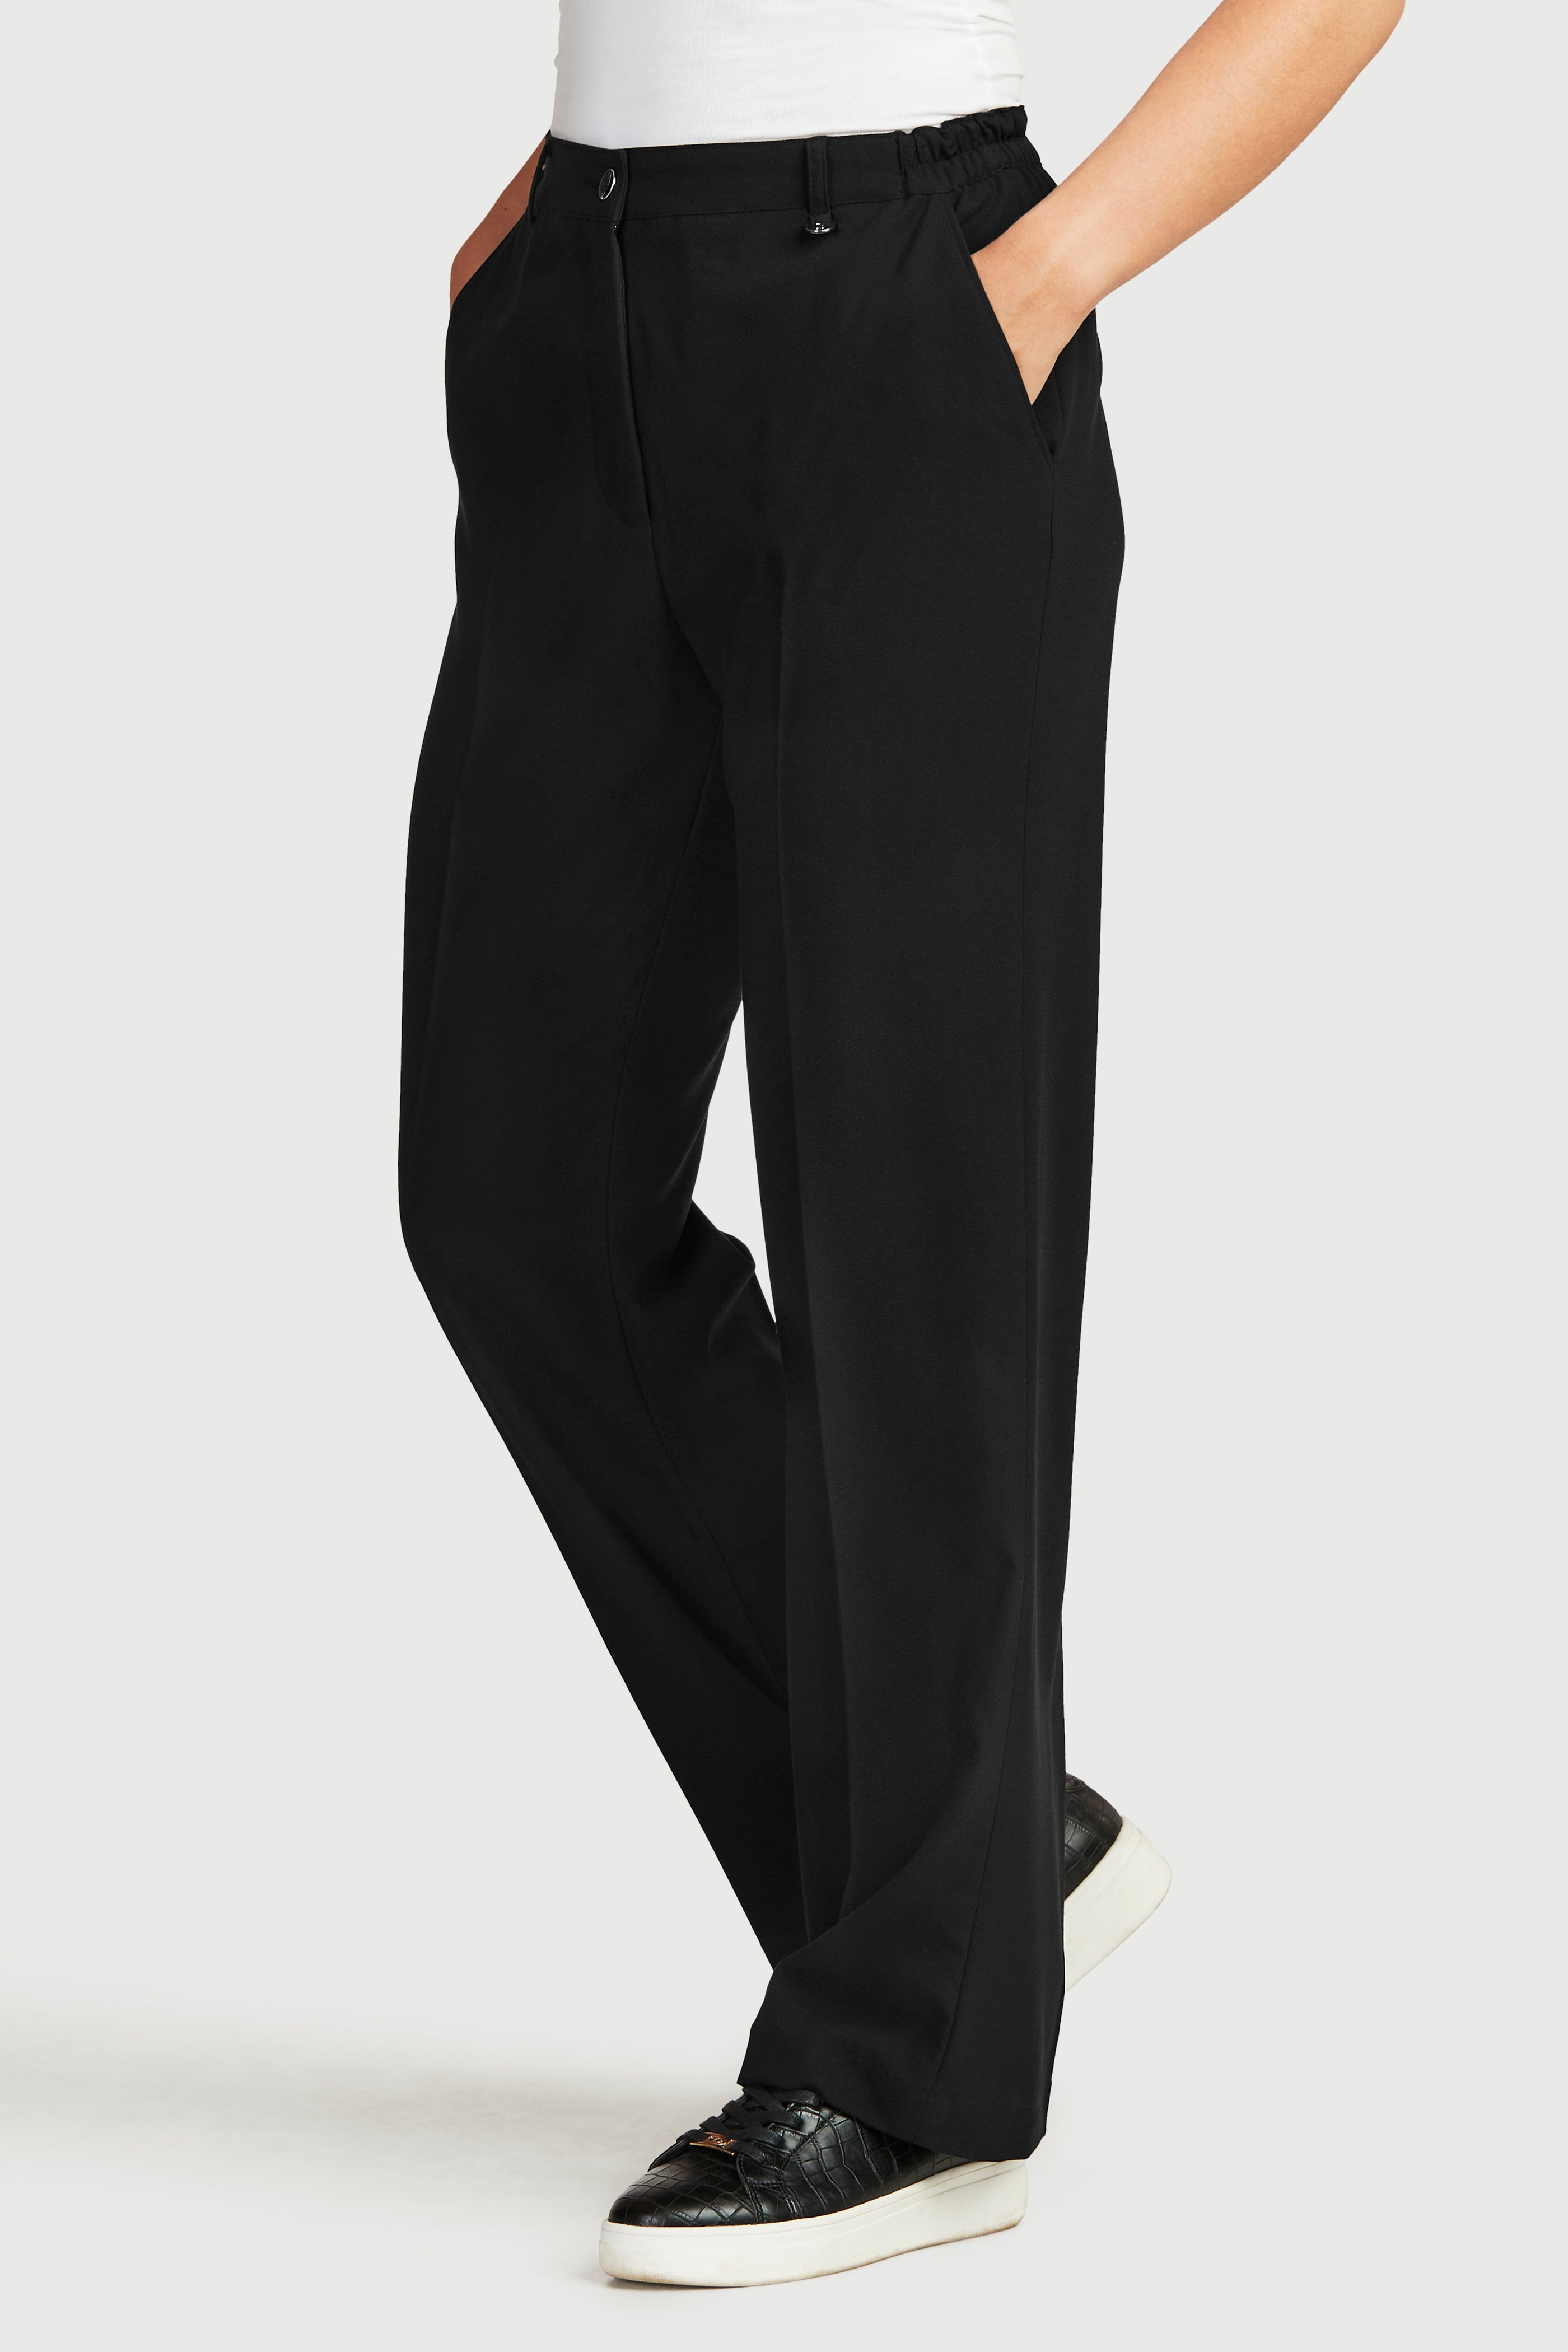 Spodnie Milly